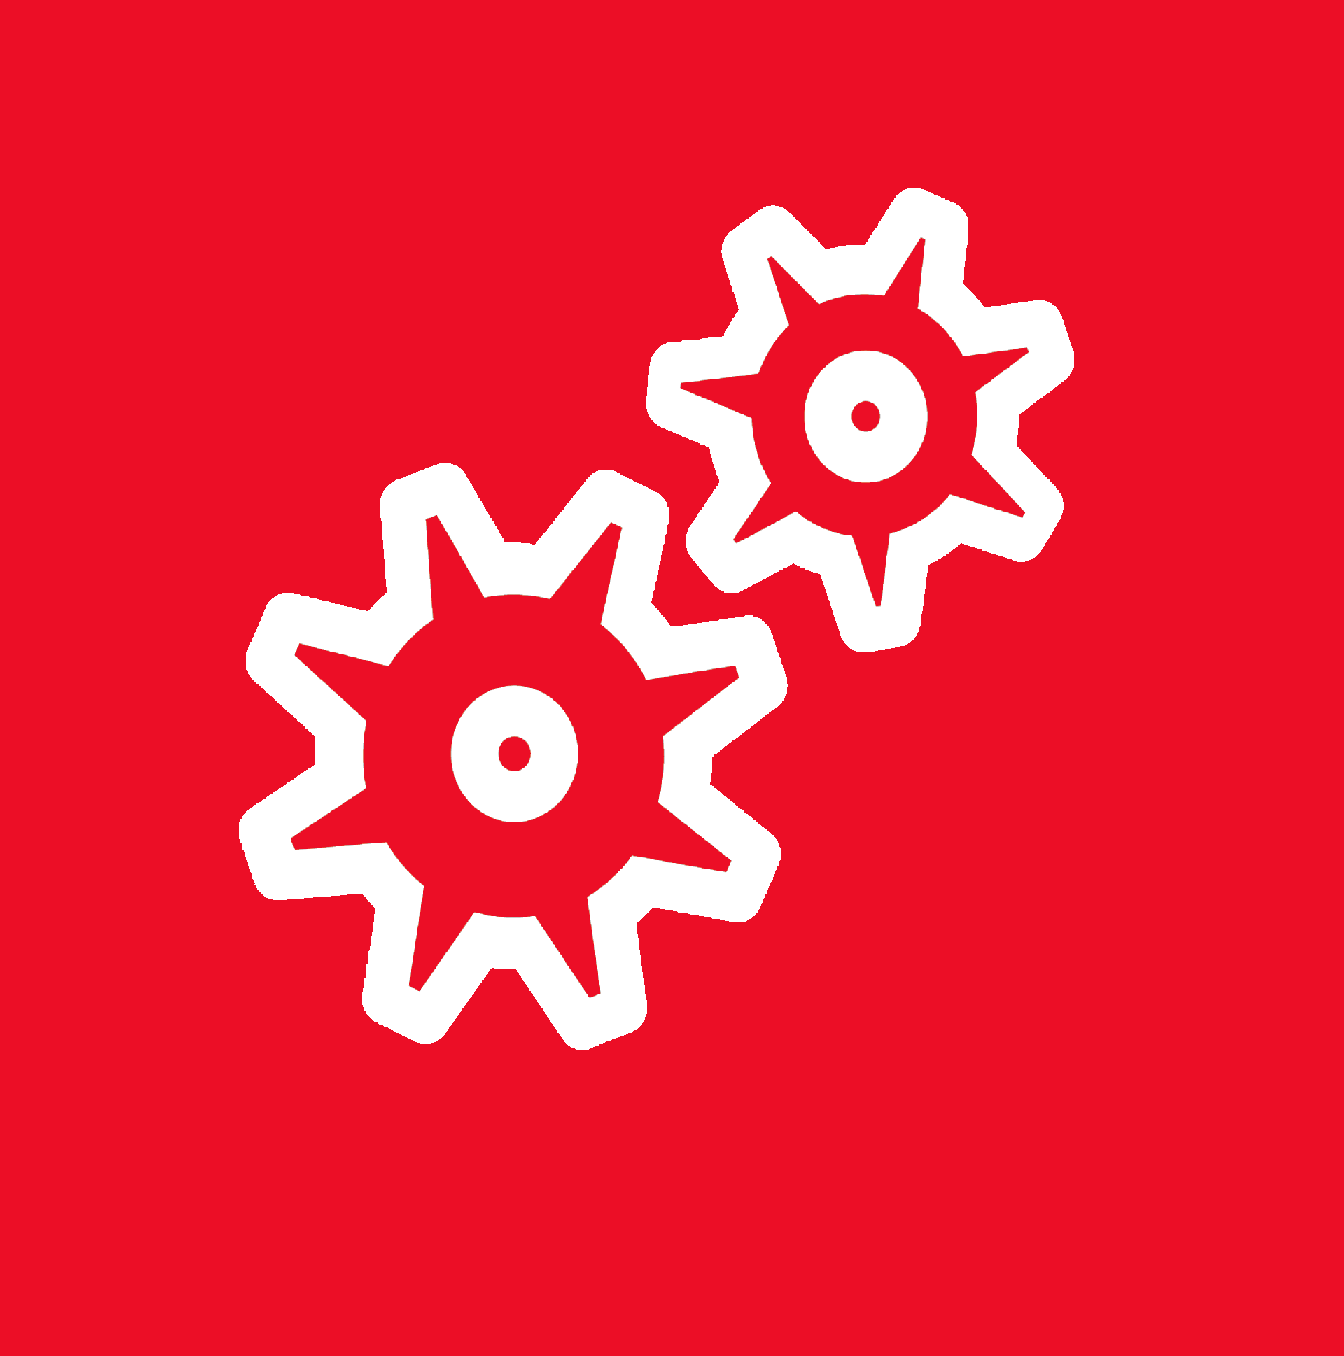 PolyMécanique